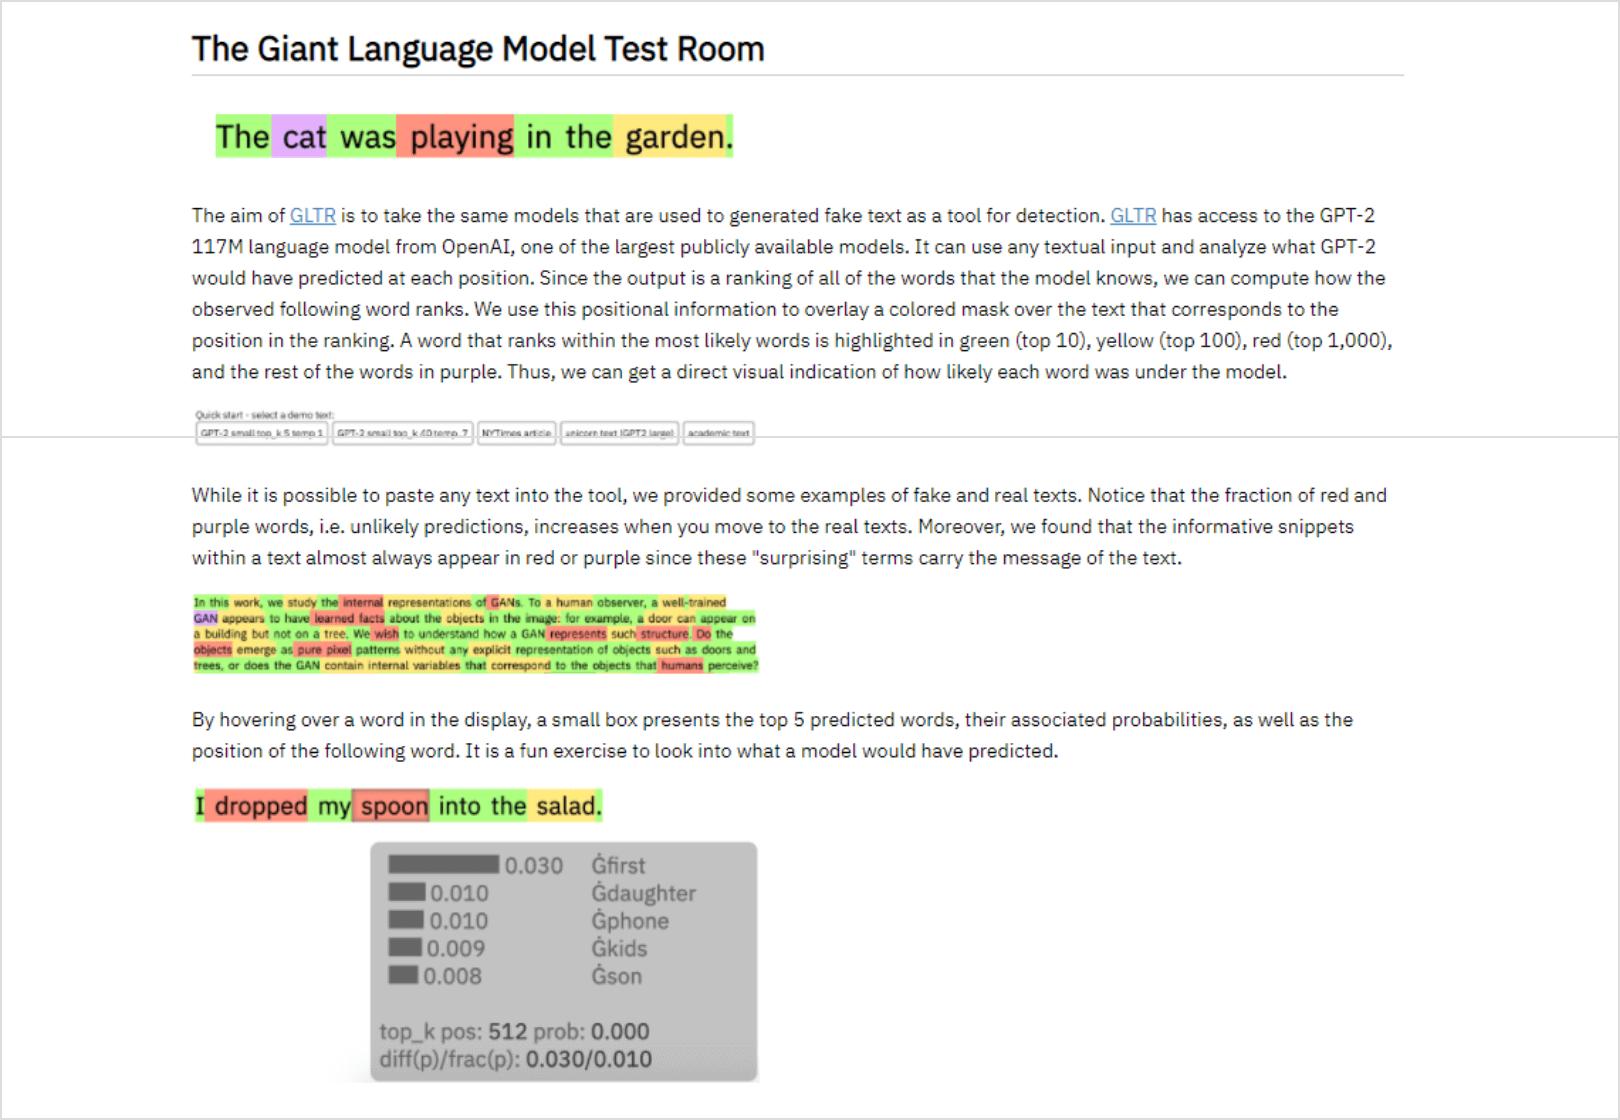 Get Rid of Fake Reviews GLTR